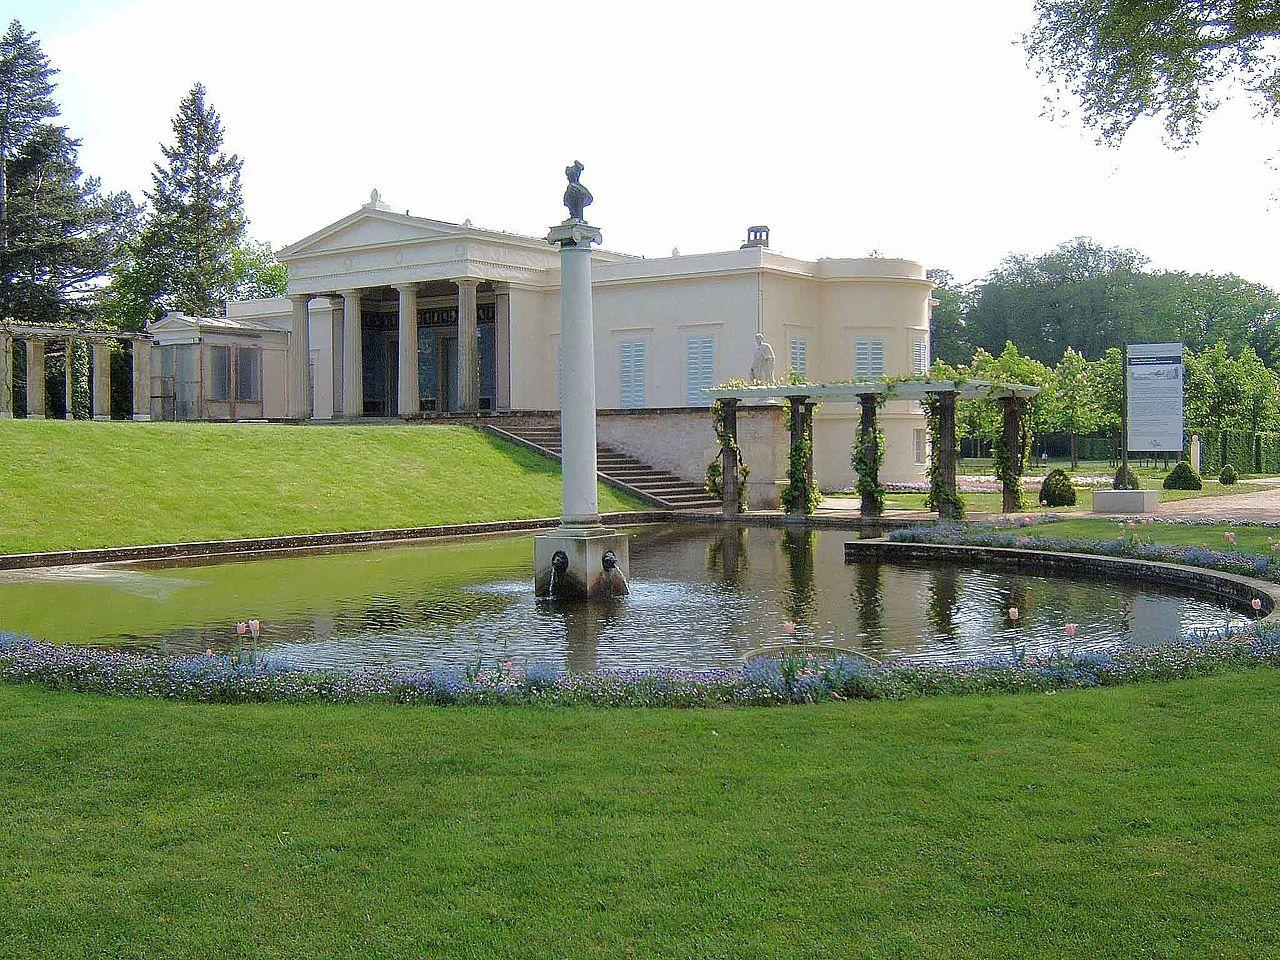 Bild Schloss Charlottenhof Potsdam